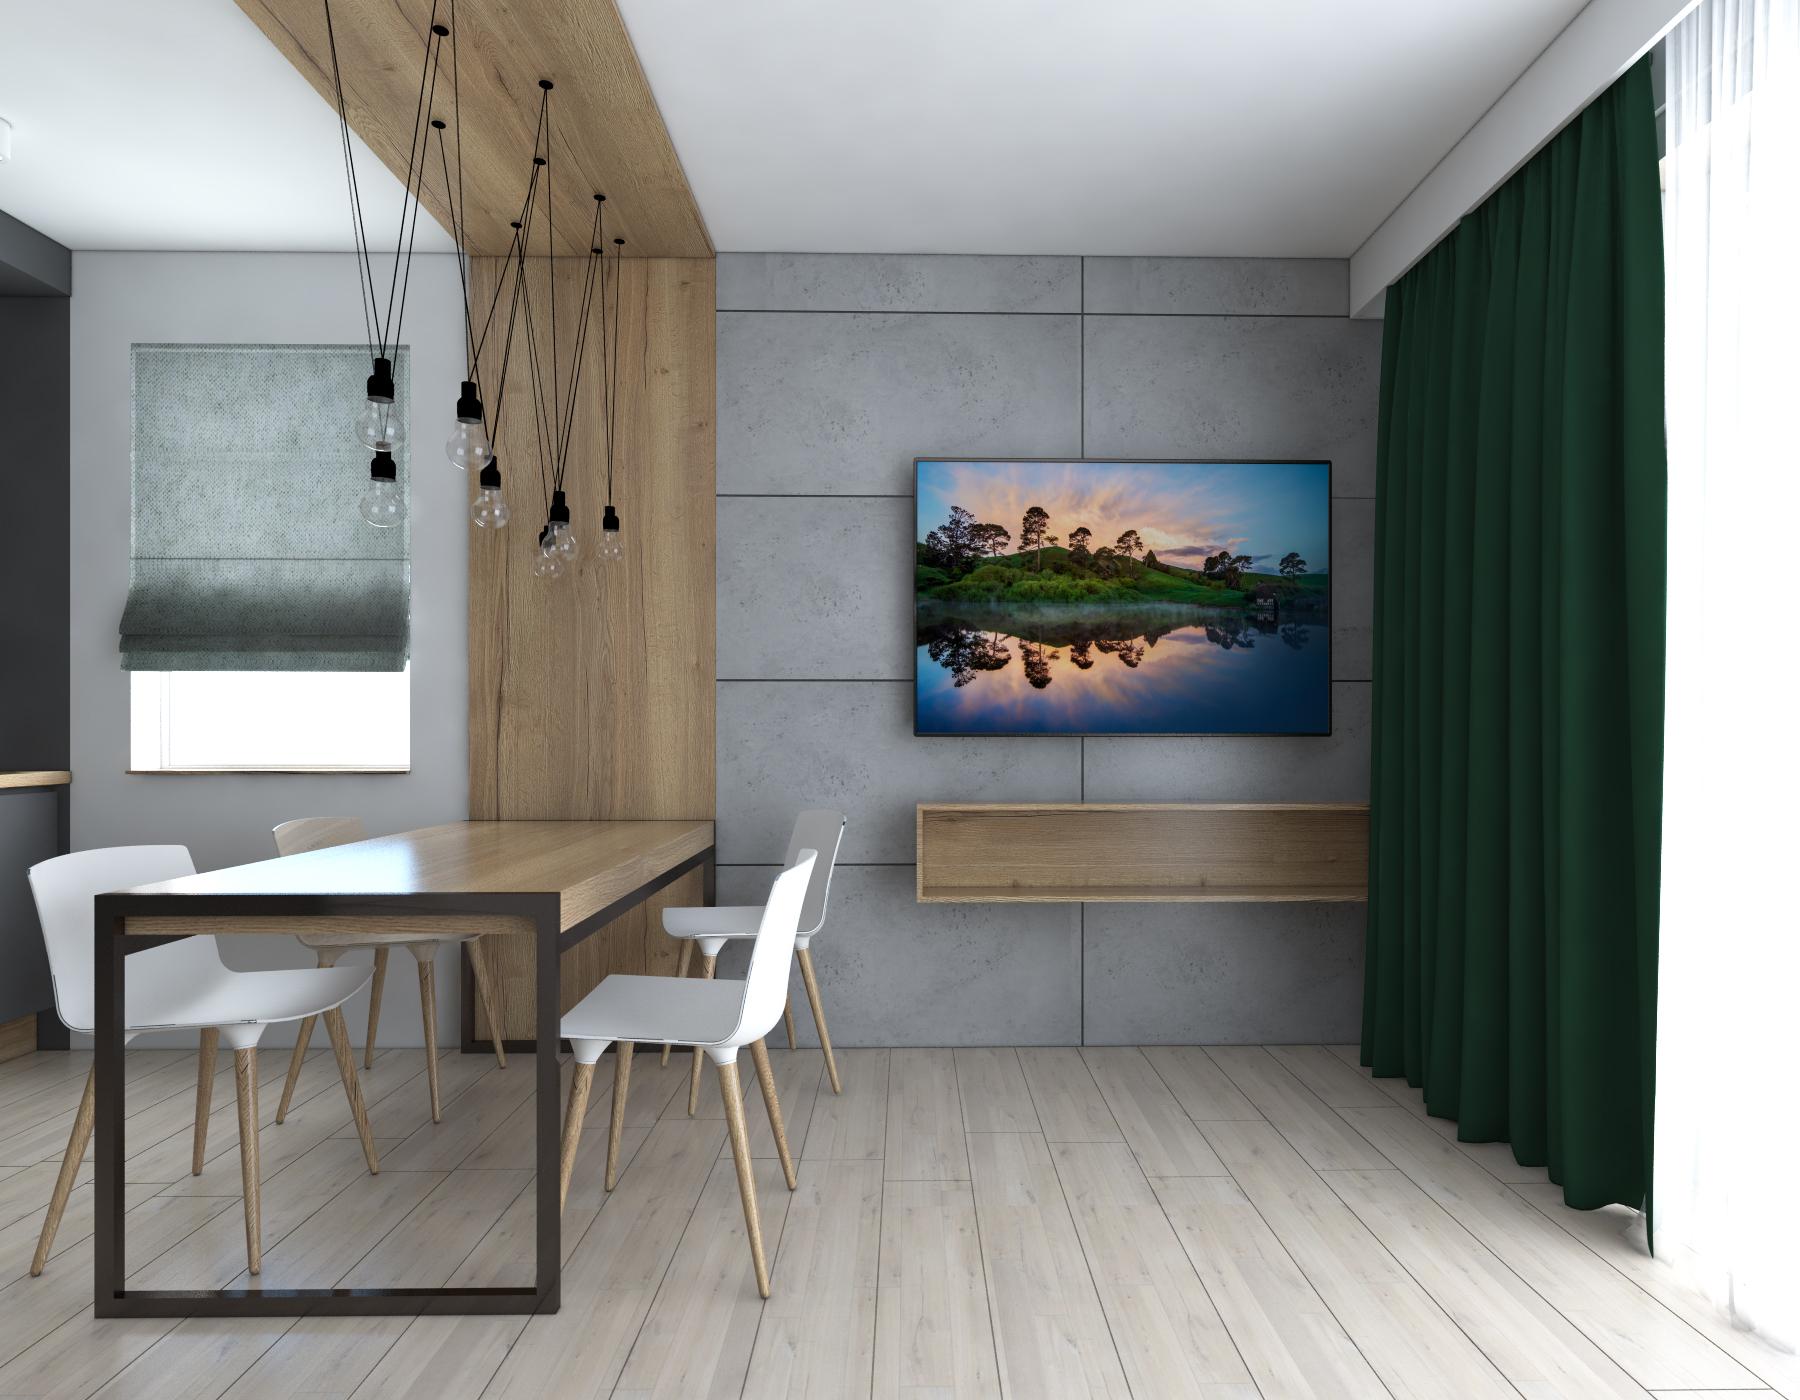 beton architektoniczny ściana TV